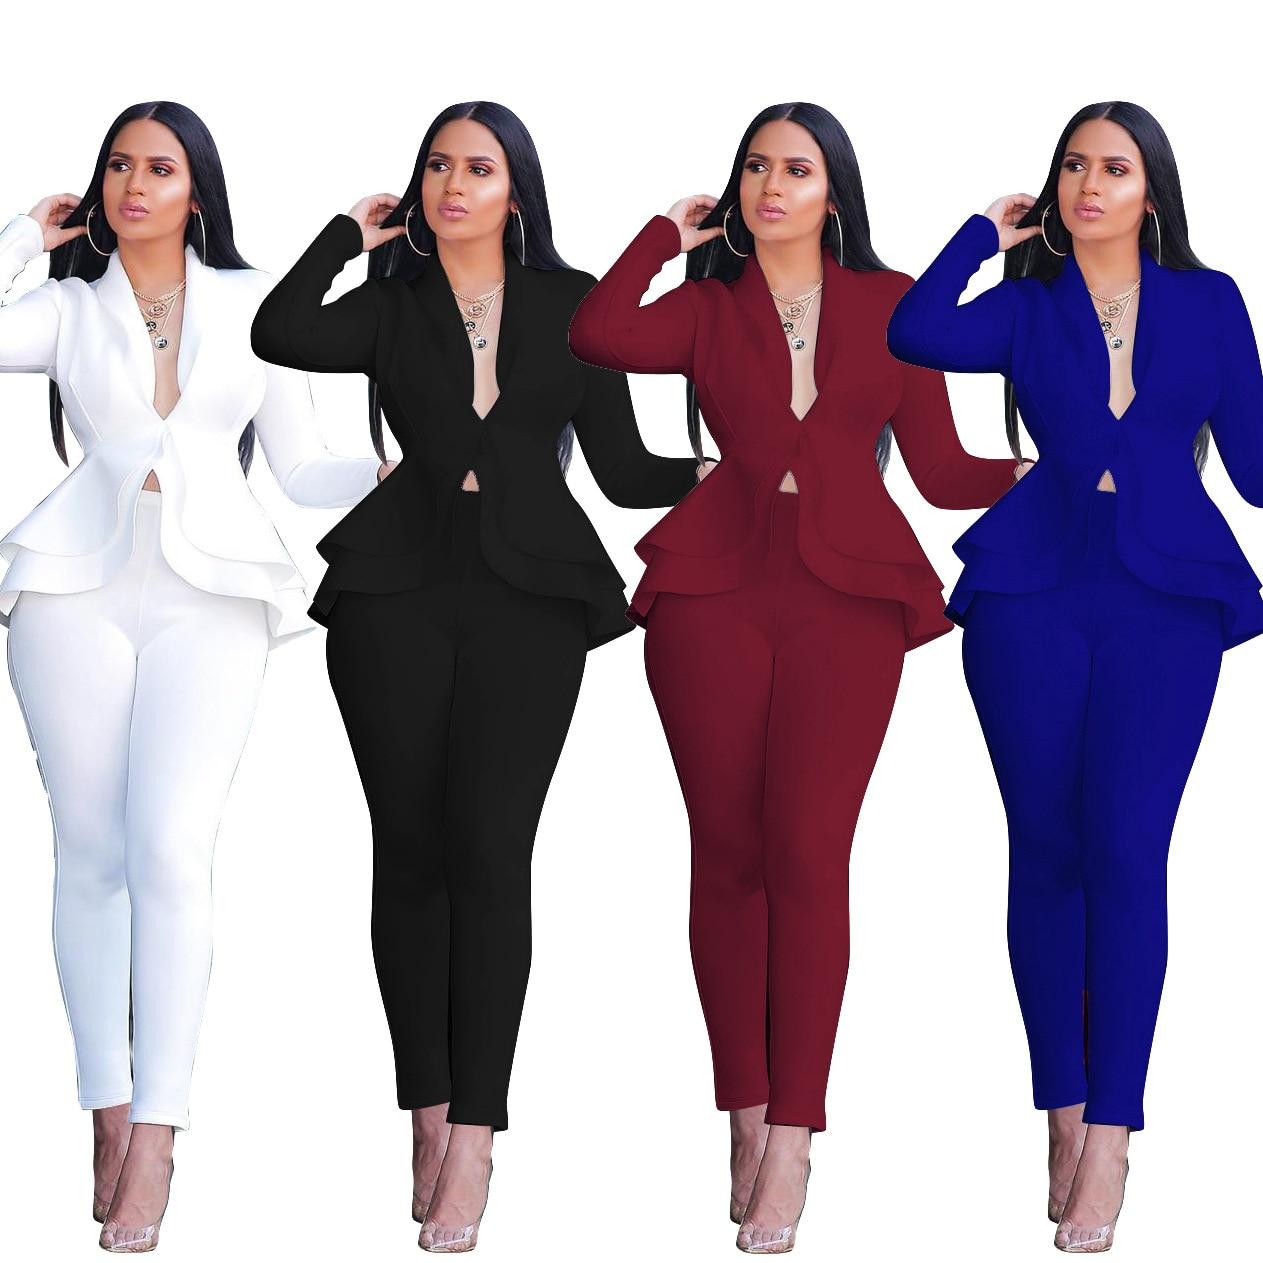 2019 European And American Fashion Lotus Leaf Air Layer Temperament Casual Solid Color New Fashion Uniform Casual Wear